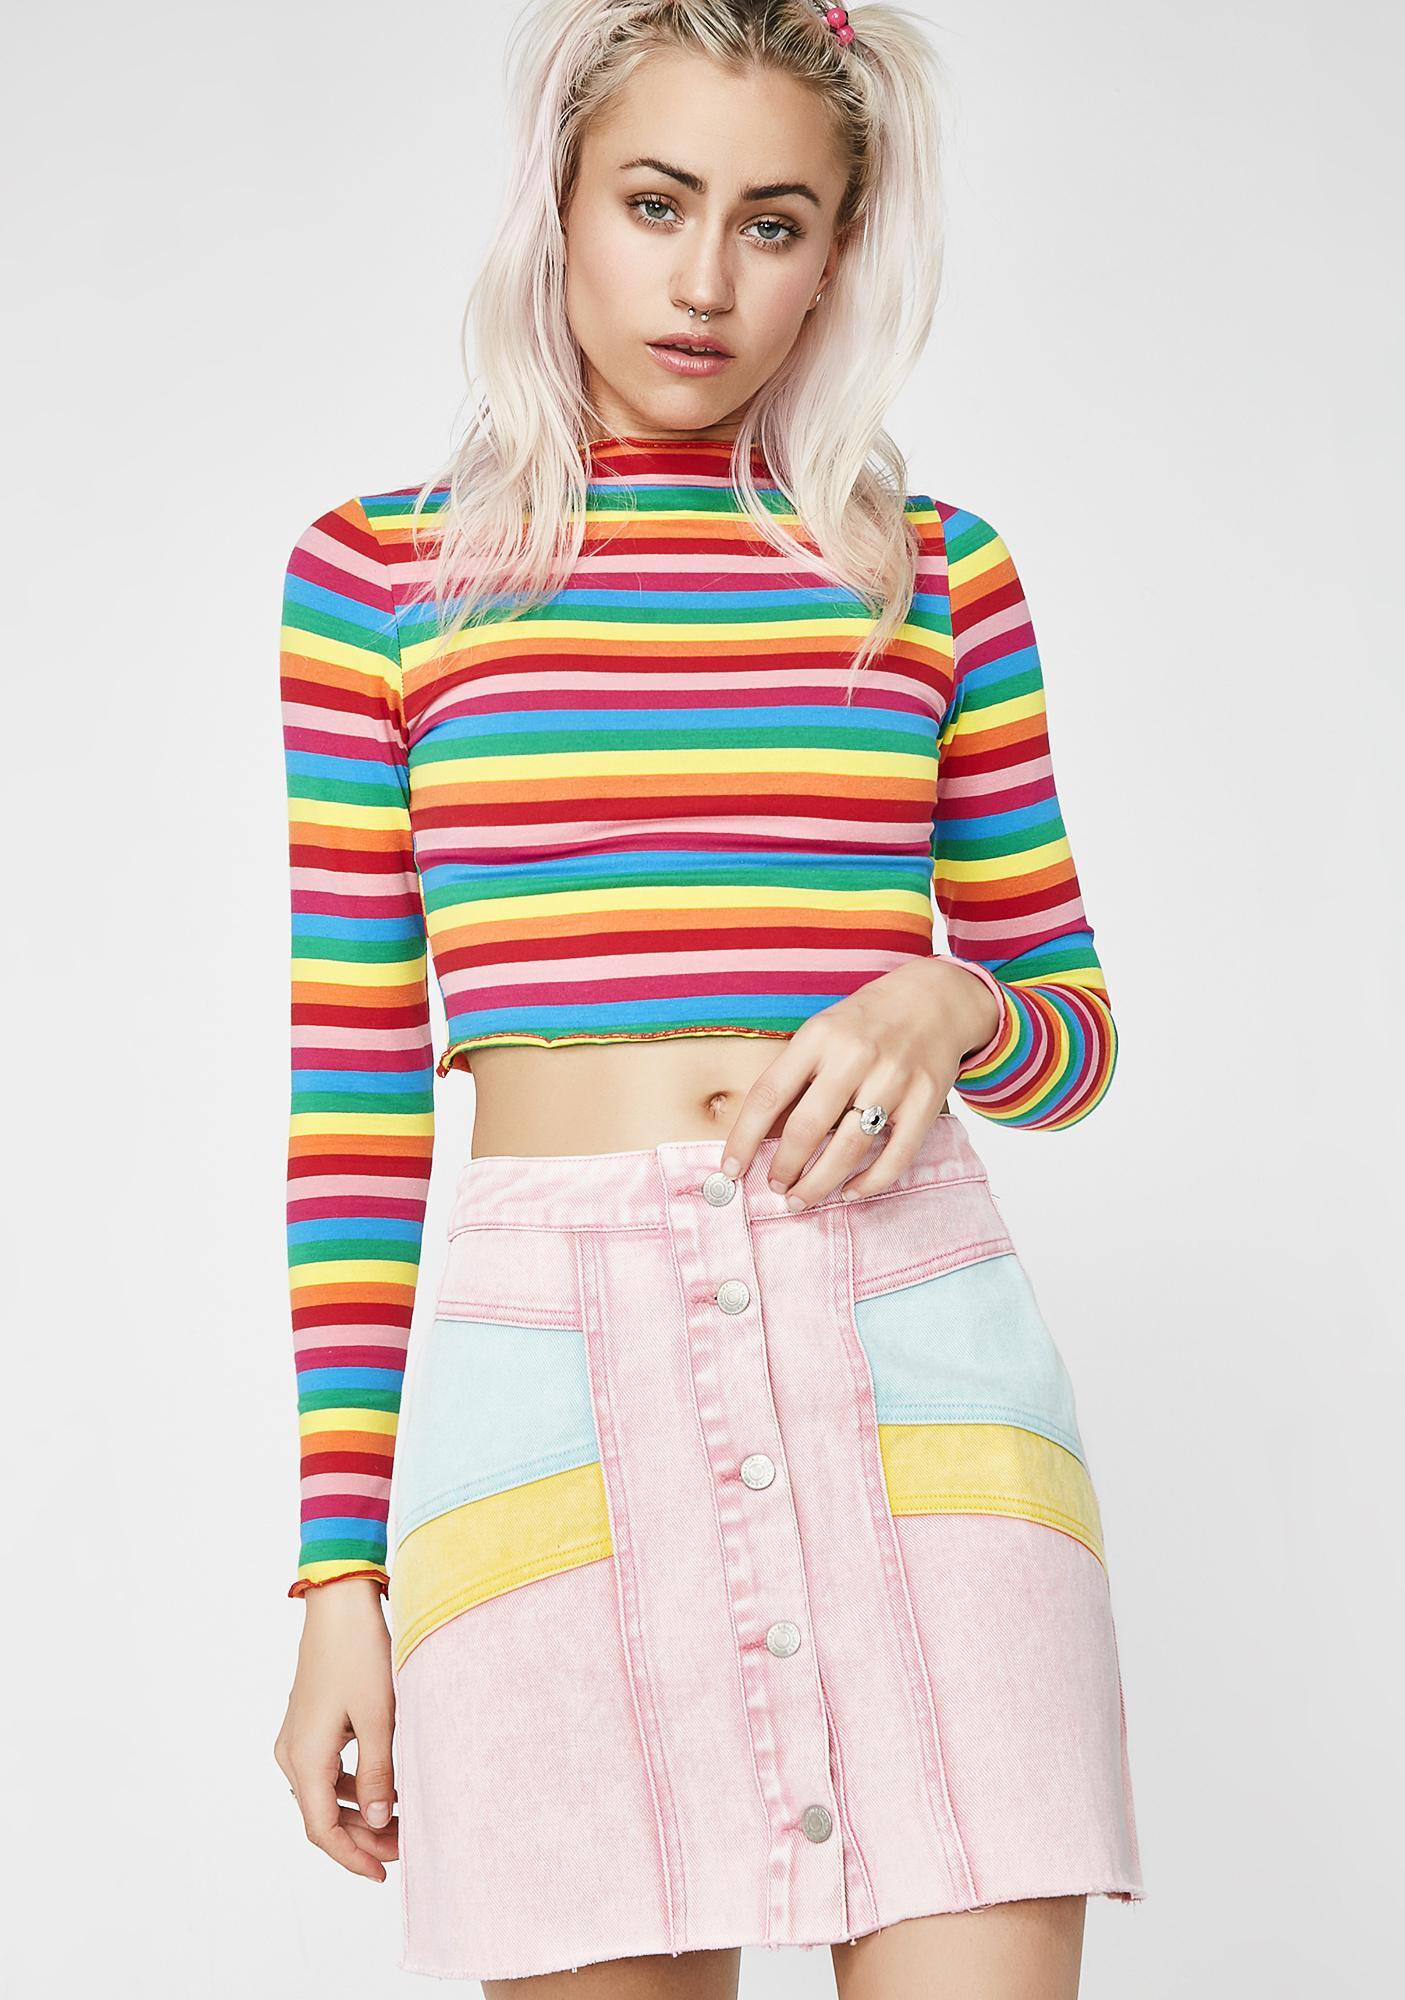 Candy Skies Denim Skirt